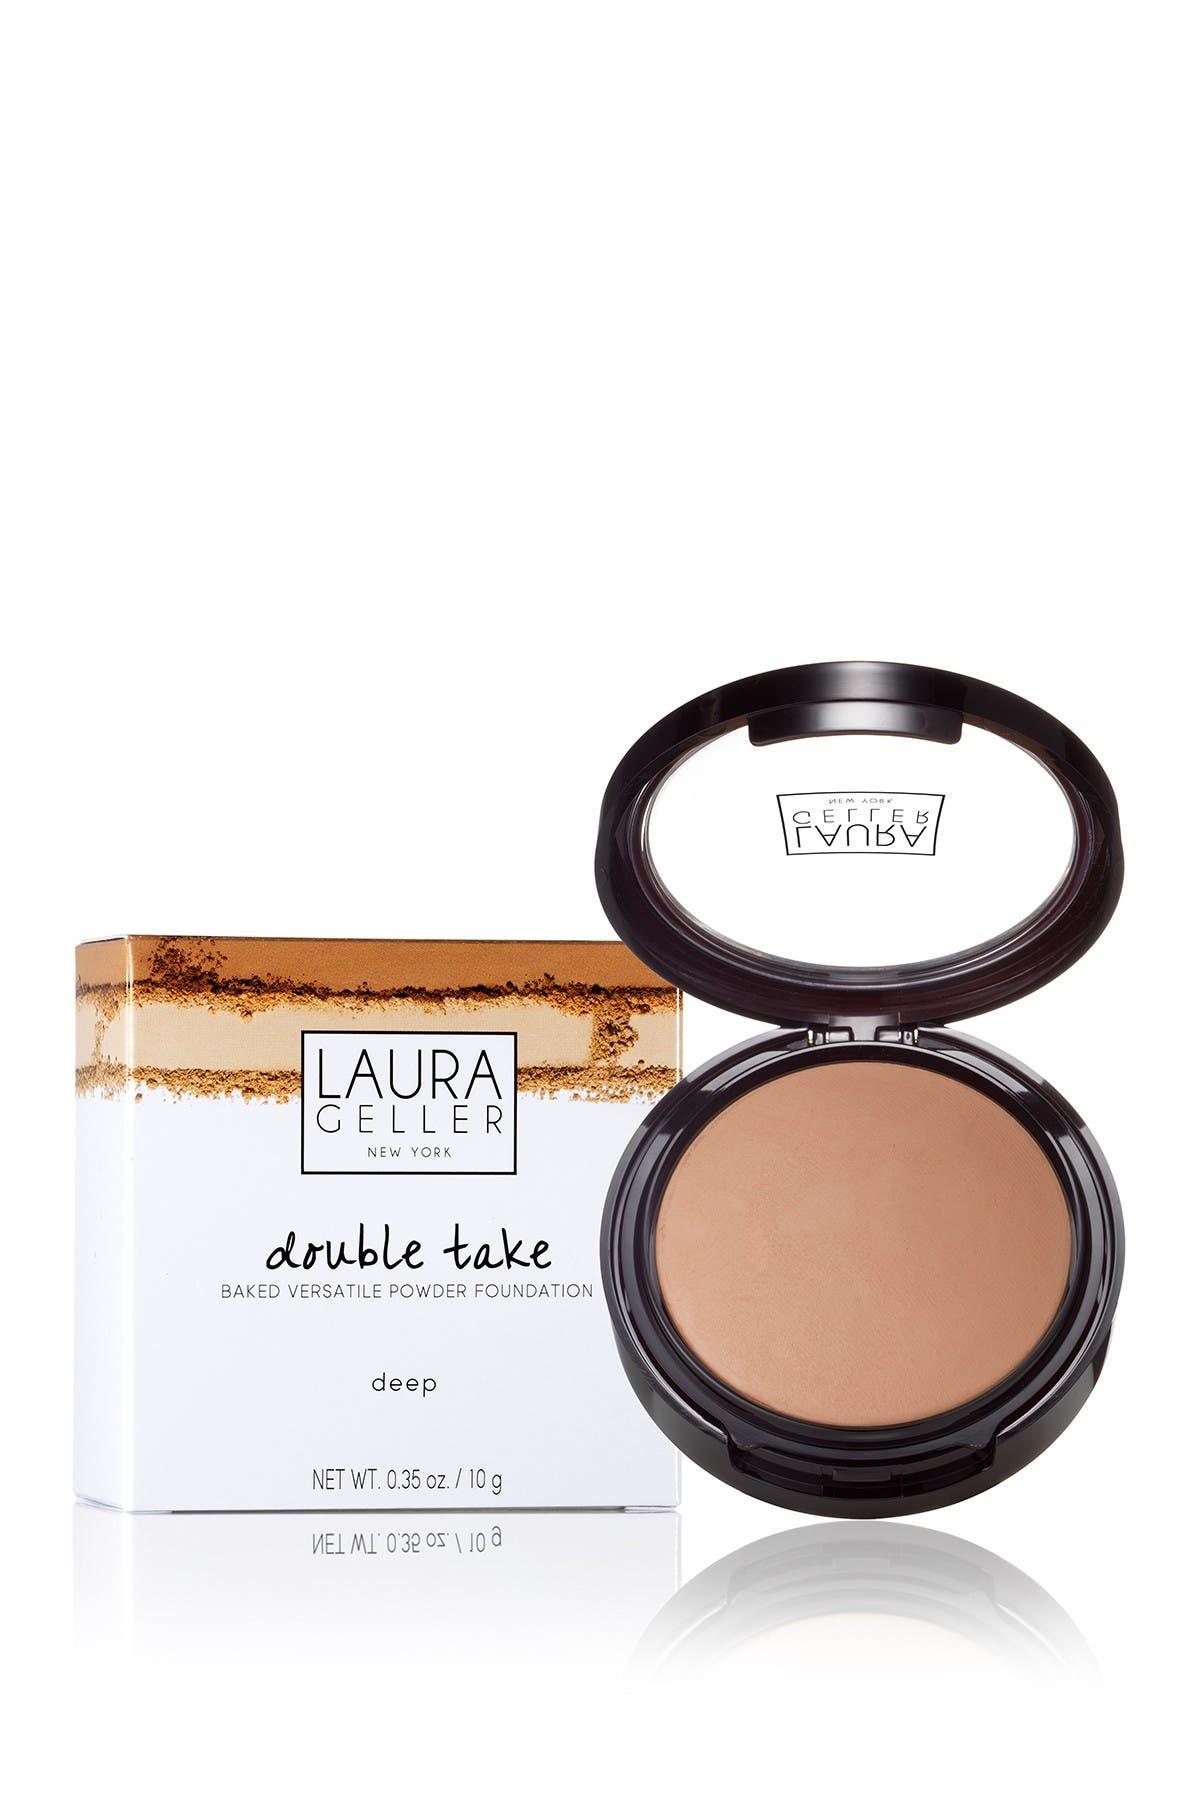 Image of Laura Geller New York 59mm Double Take Baked Versatile Powder Foundation - Deep